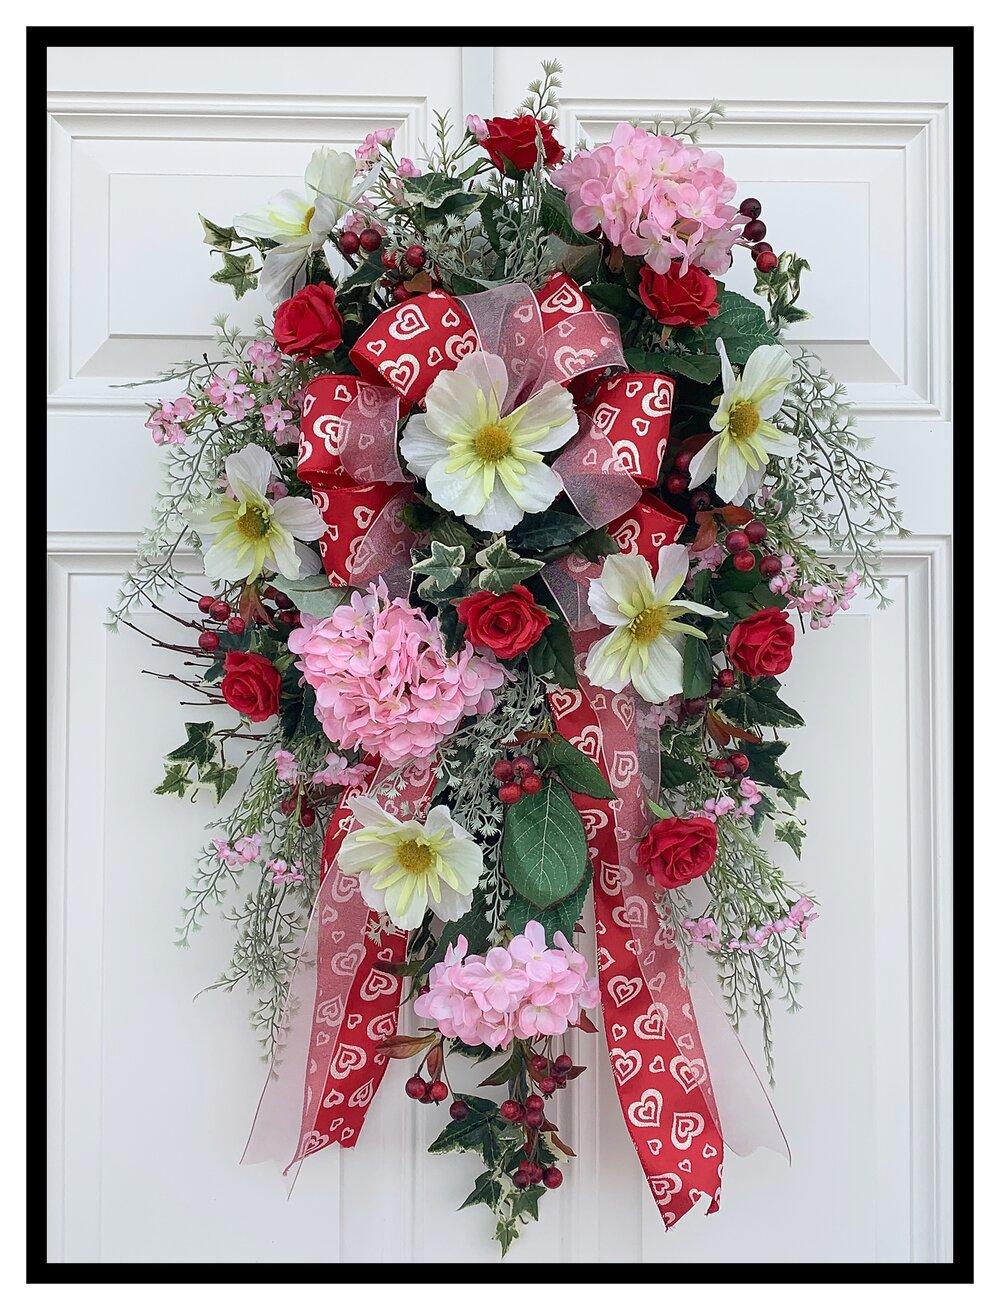 Spring Swag Wreath,Spring Teardrop Swag,Floral Swag,Spring Wreaths for Front Door,Spring Summer Swag,Easter Swag,Elegant Wreath,Spring Decor